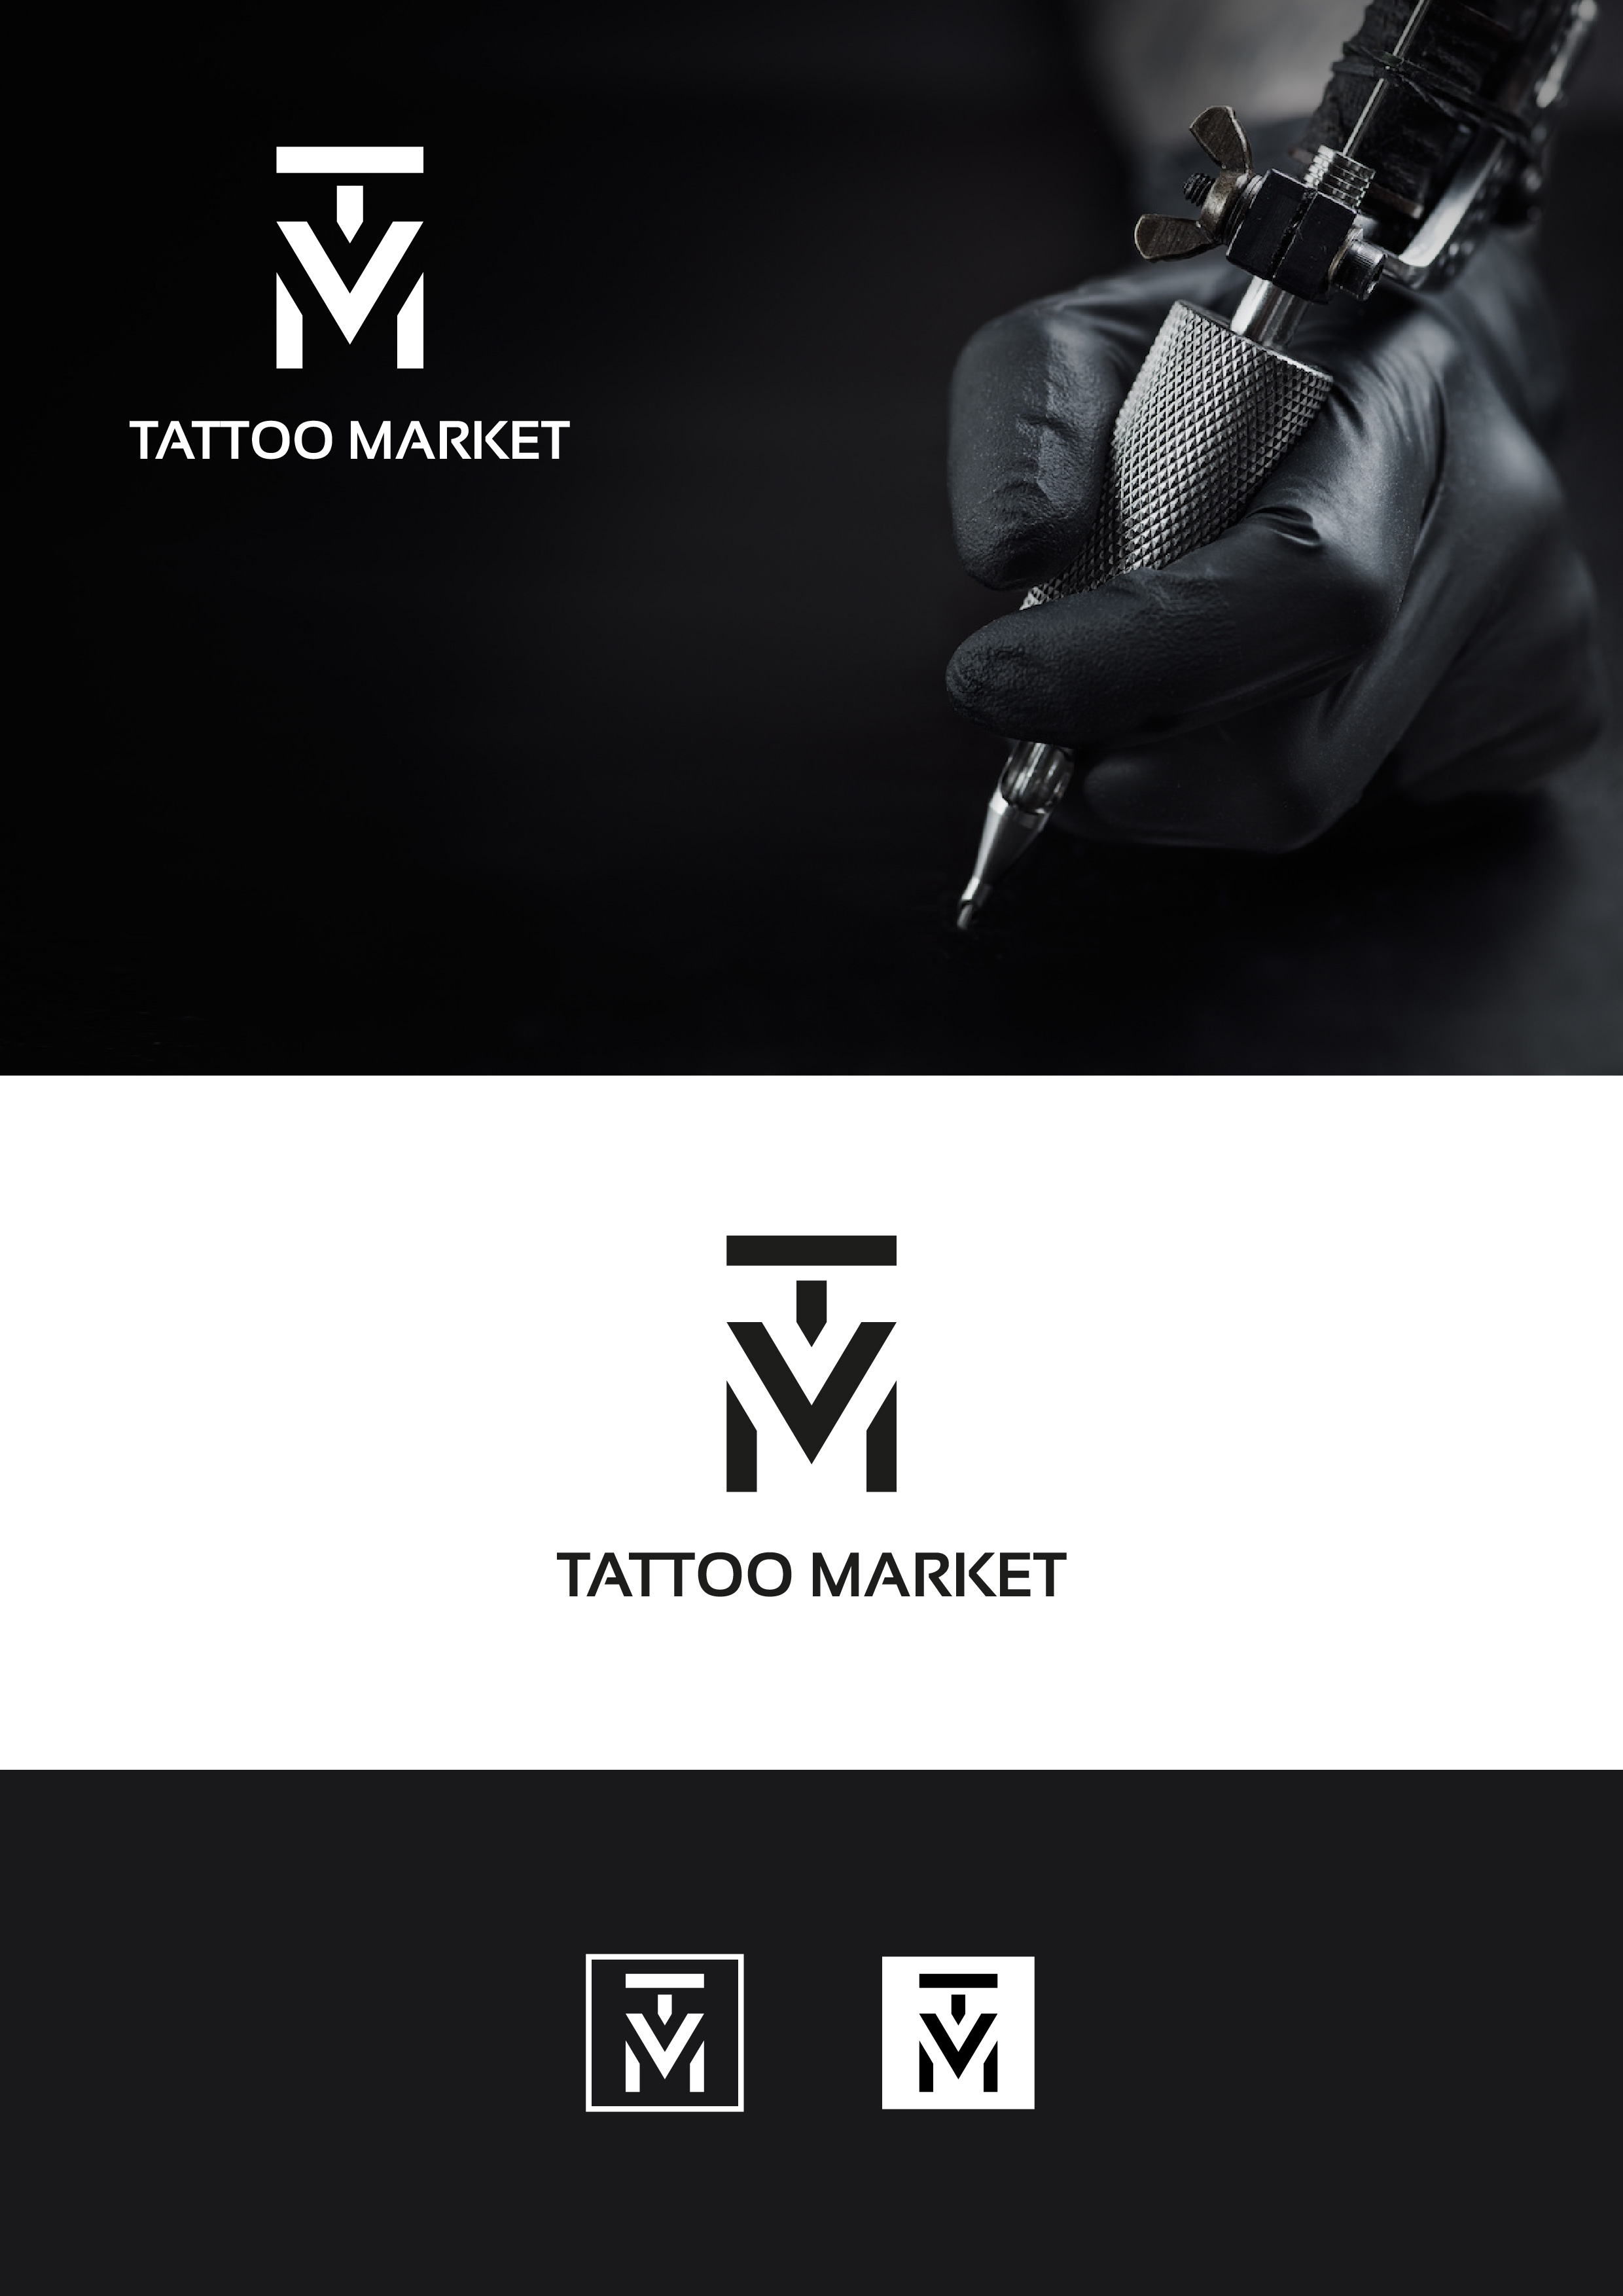 Редизайн логотипа магазина тату оборудования TattooMarket.ru фото f_4125c3df448a253f.jpg